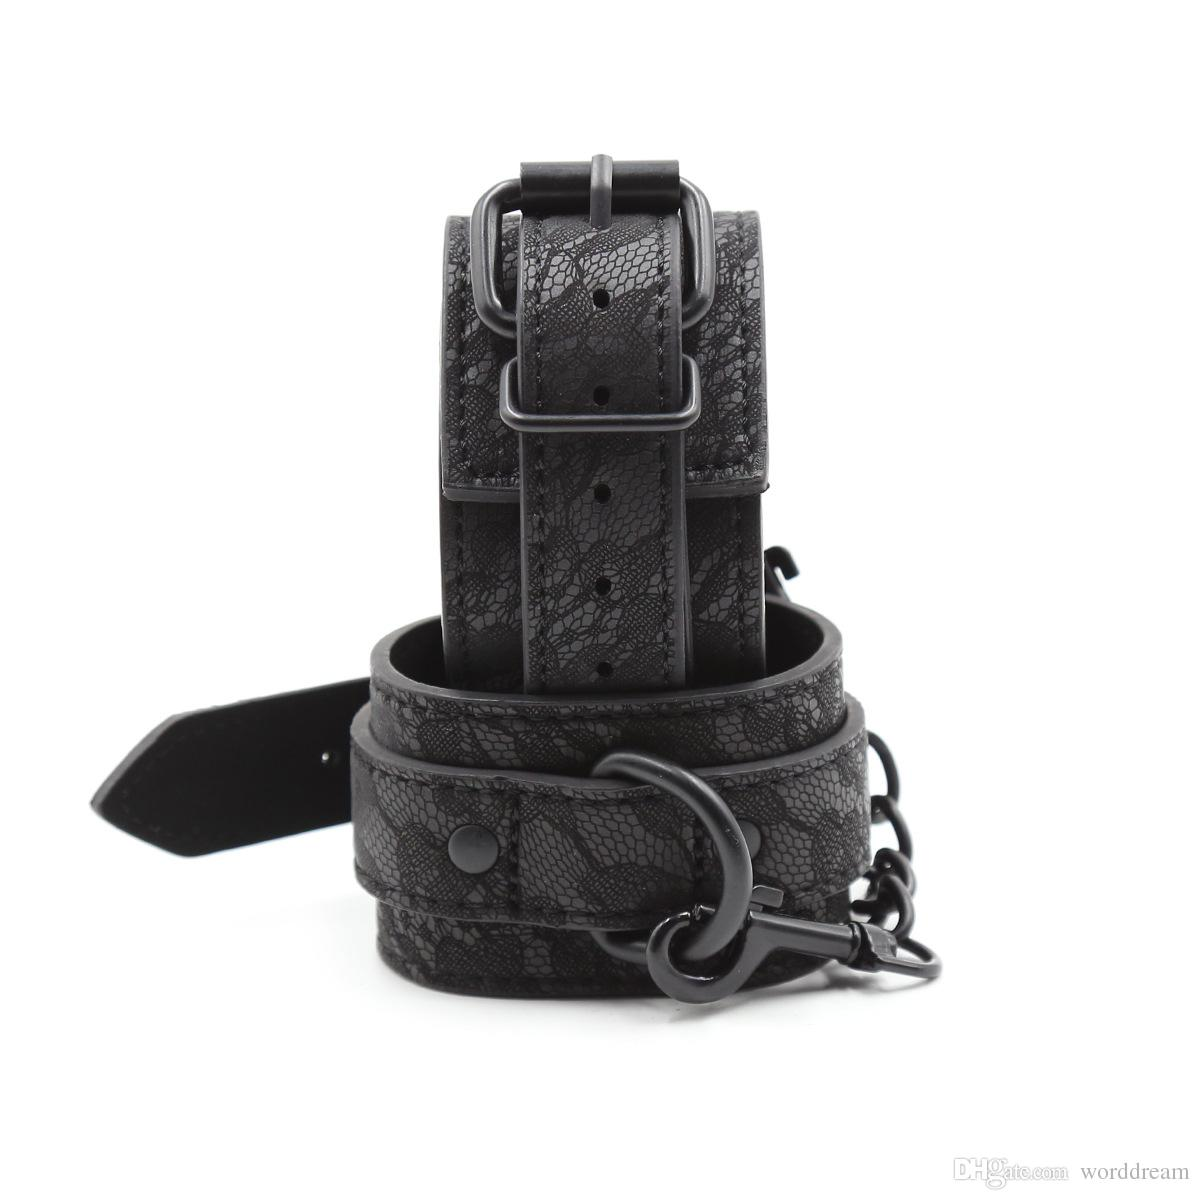 Hand Cuffs Bdsm Leather Wrist Cuffs Bondage Slave Restraints Belt In Adult Games For Couples Fetish Sex Toys For Women Men - HK10